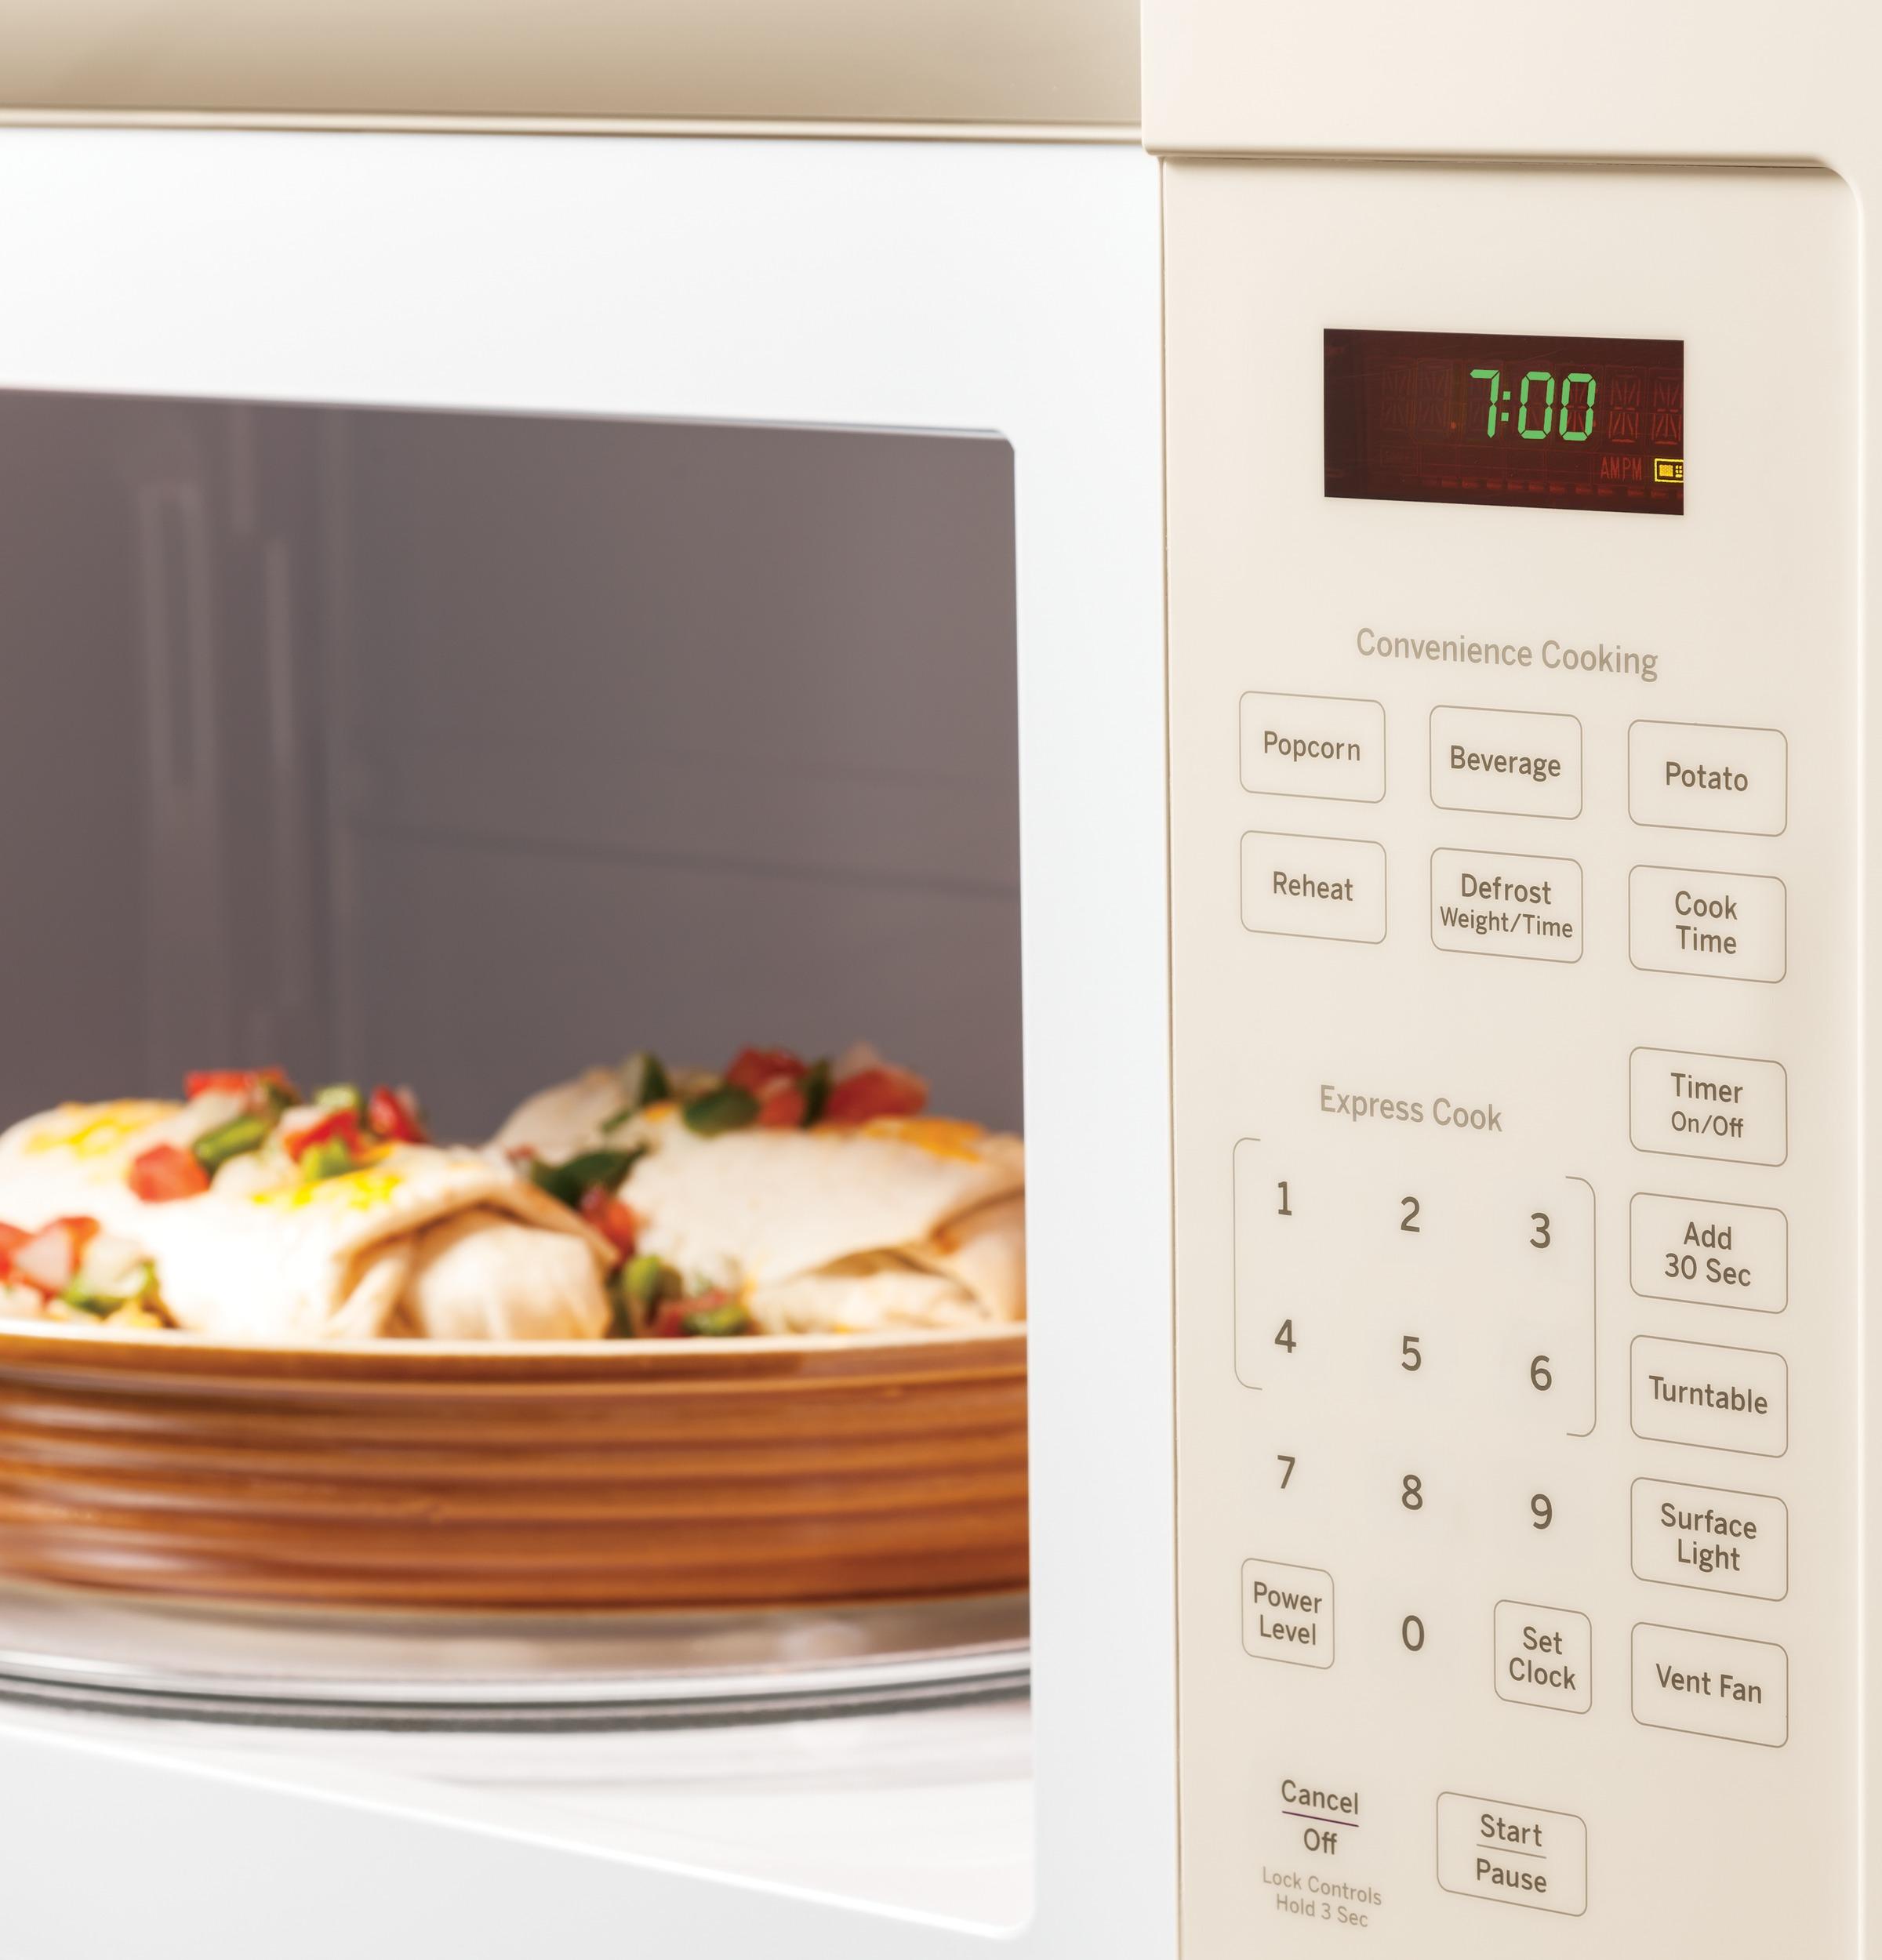 Model: JVM3160DFCC | GE GE® 1.6 Cu. Ft. Over-the-Range Microwave Oven